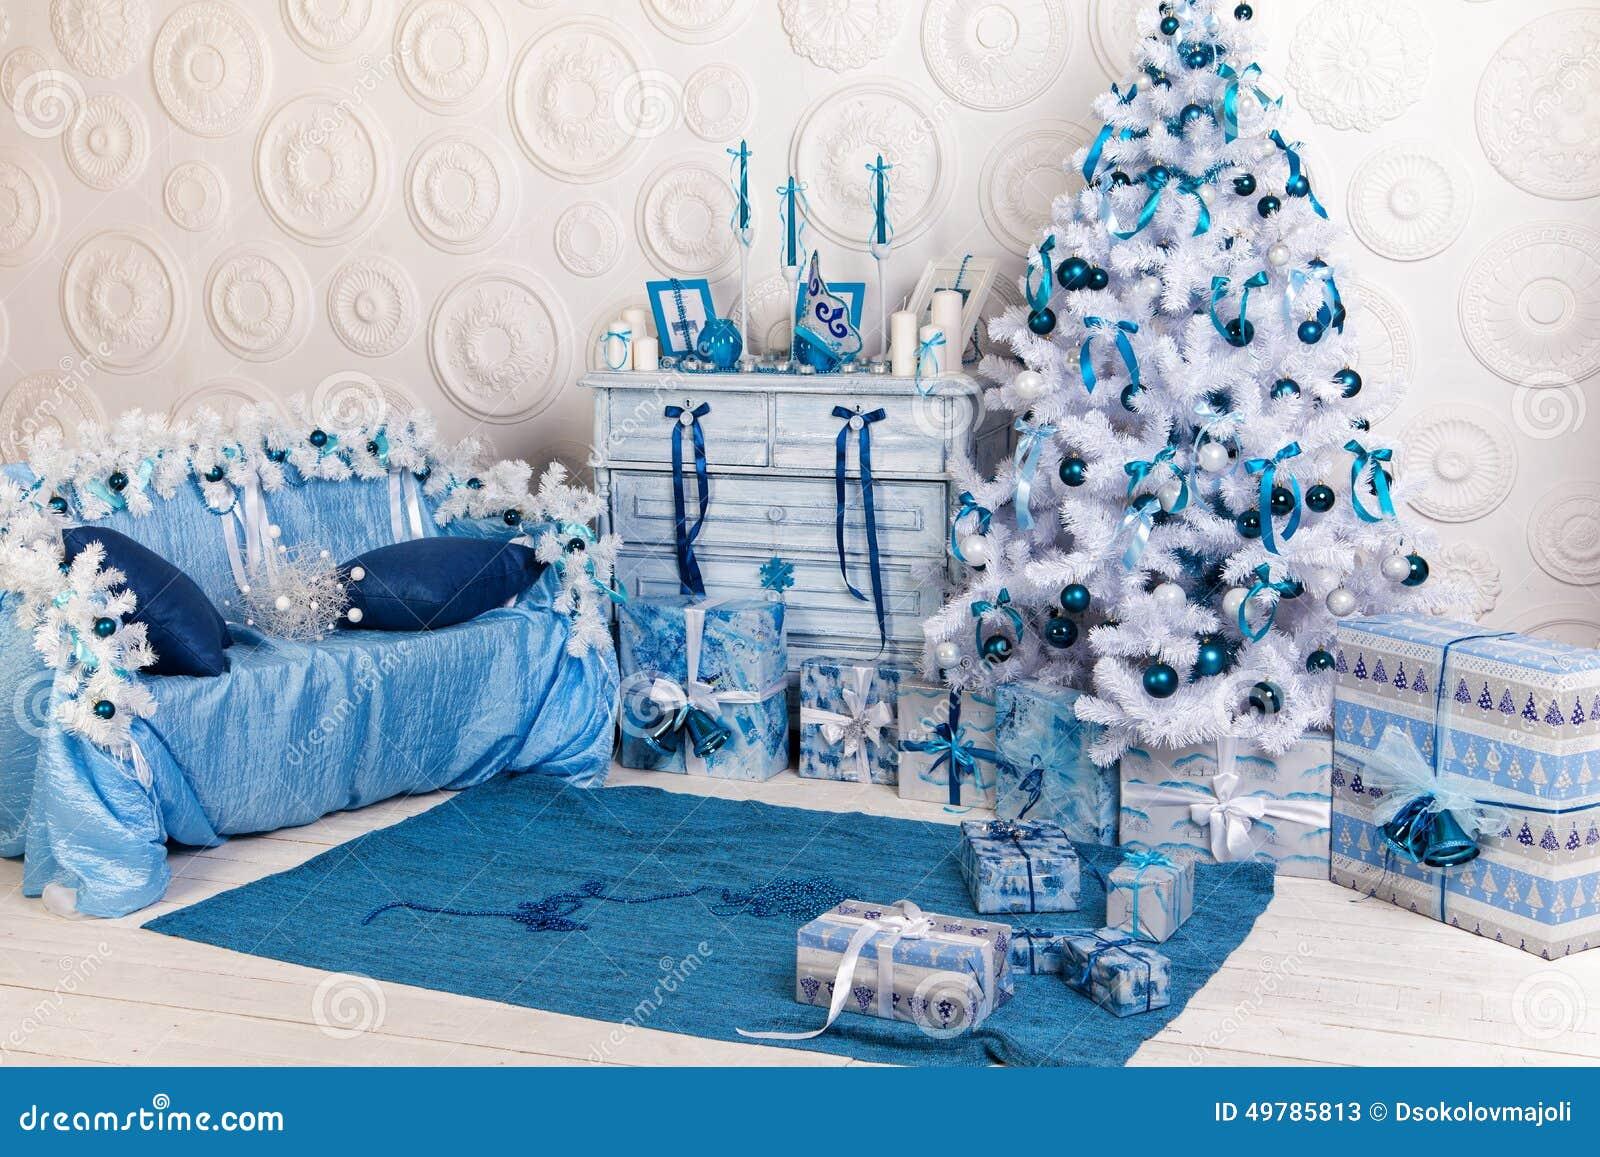 Decoration Bleu Pour Sapin De No Ef Bf Bdl Blanc